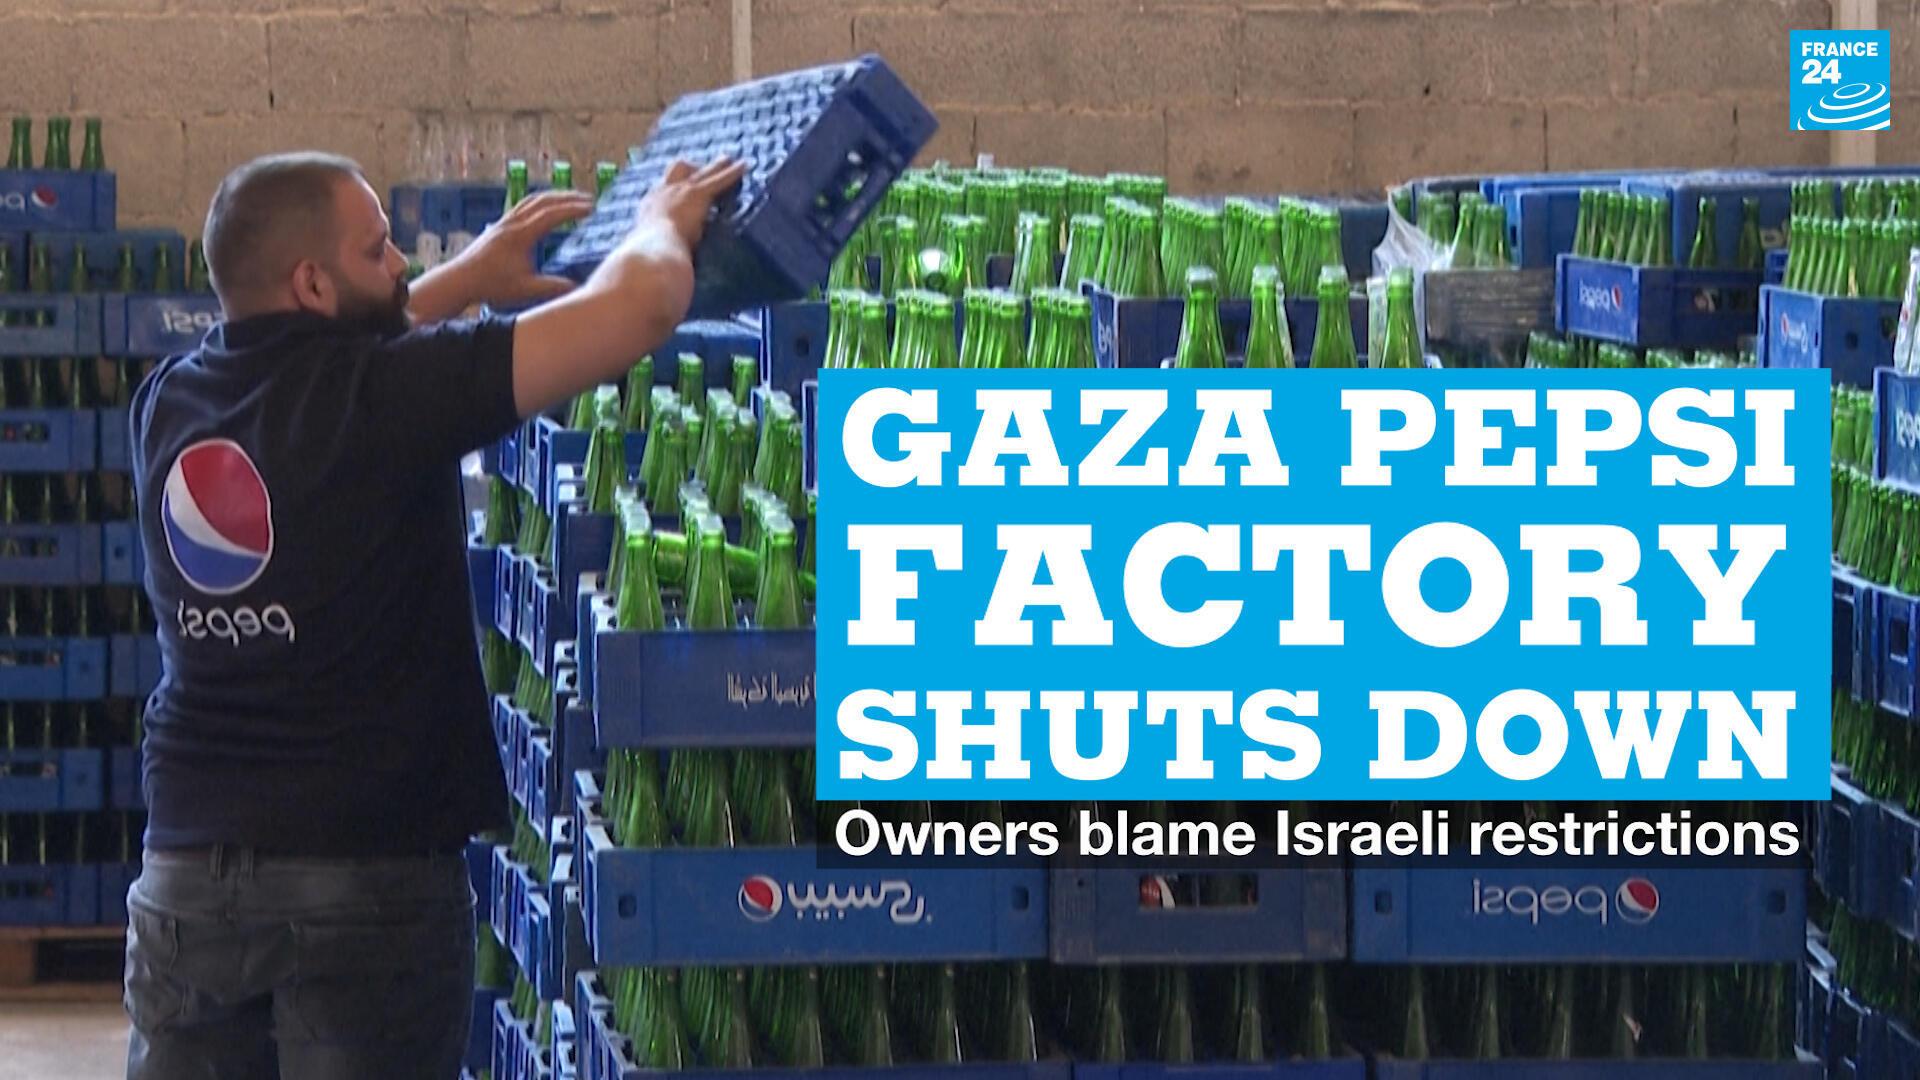 Gaza, Pepsi factory